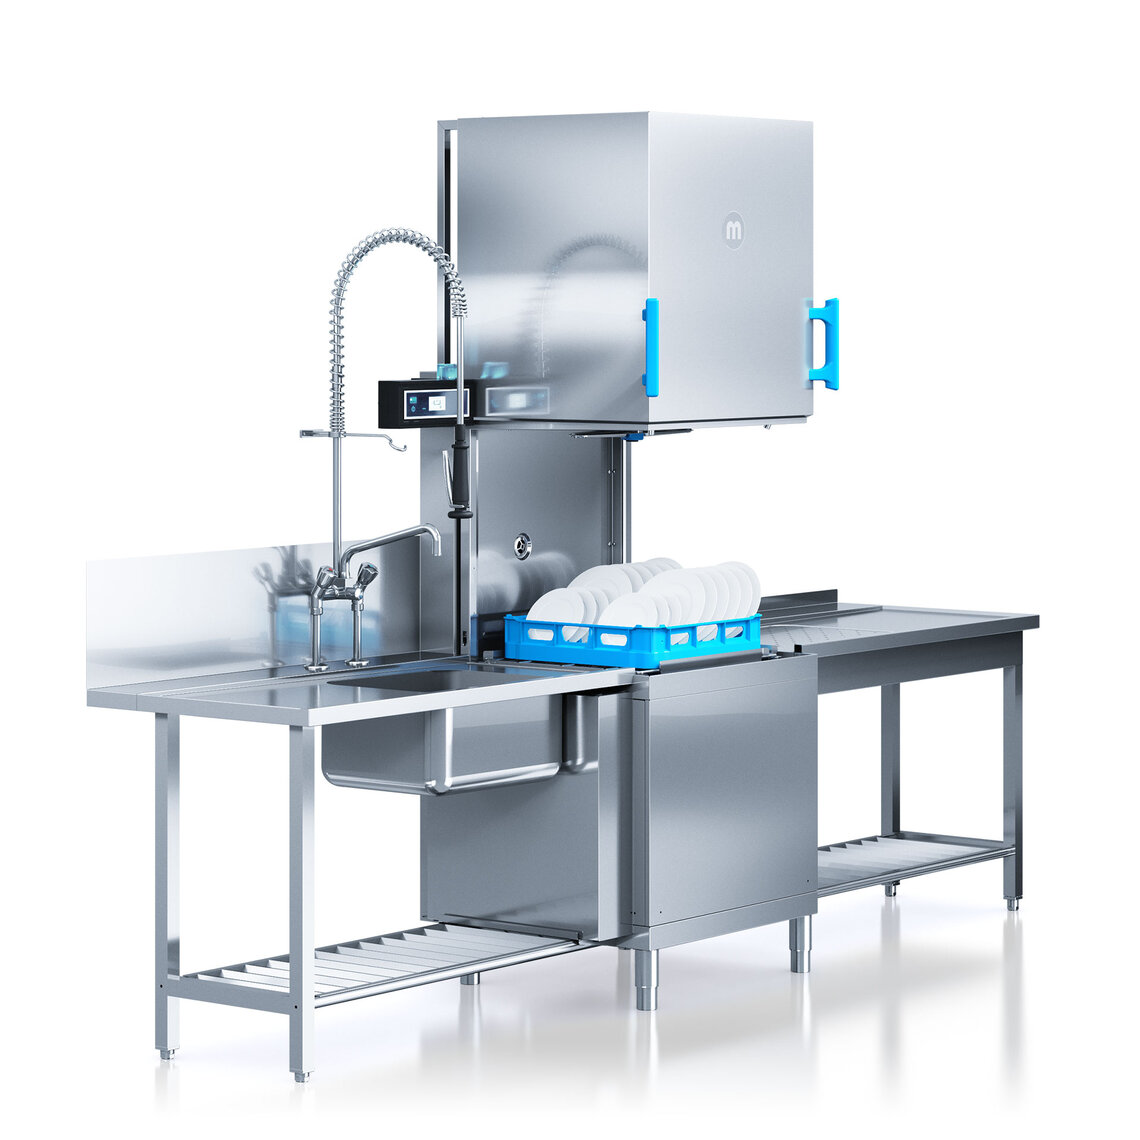 Industrial Kitchen Dishwasher: Commercial Kitchen Dishwasher